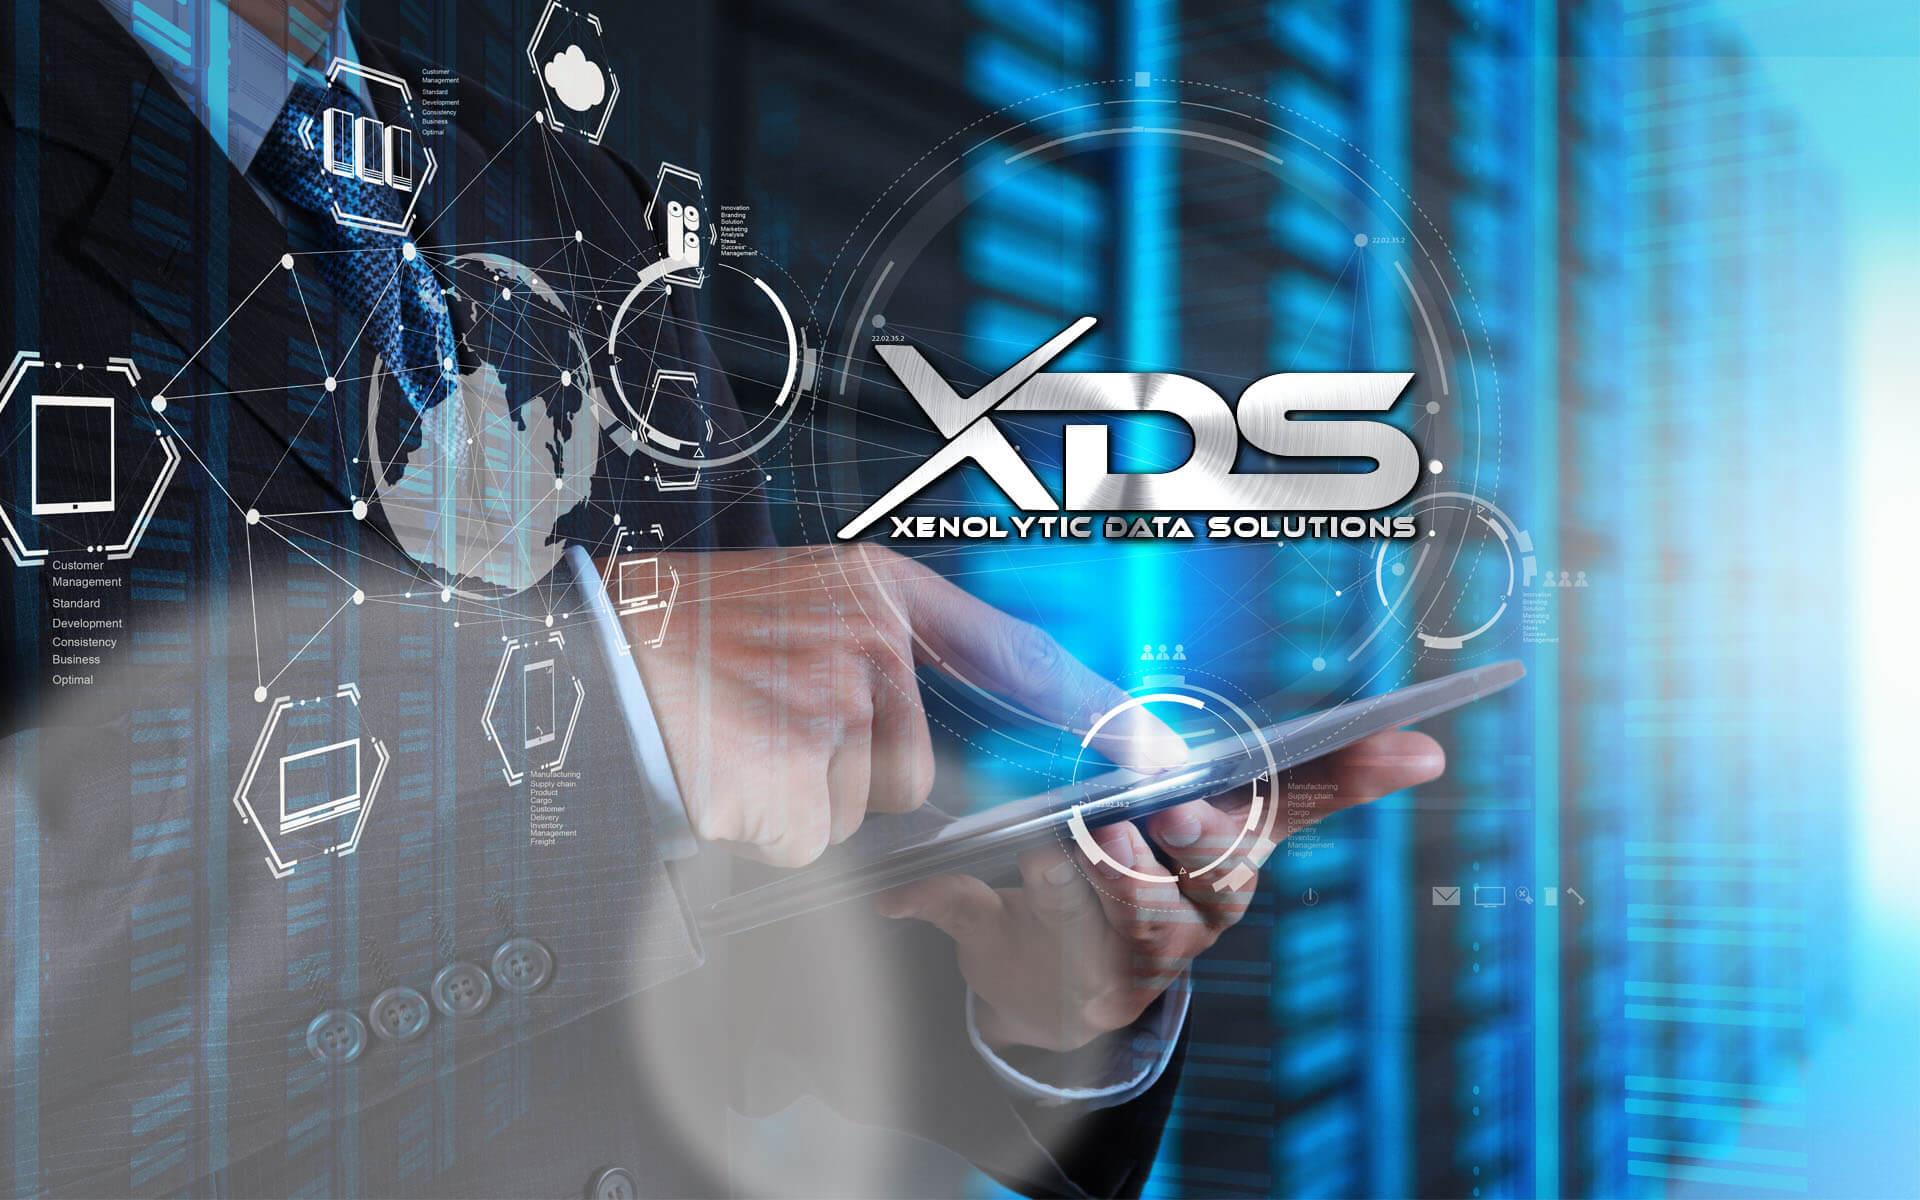 xds-slider